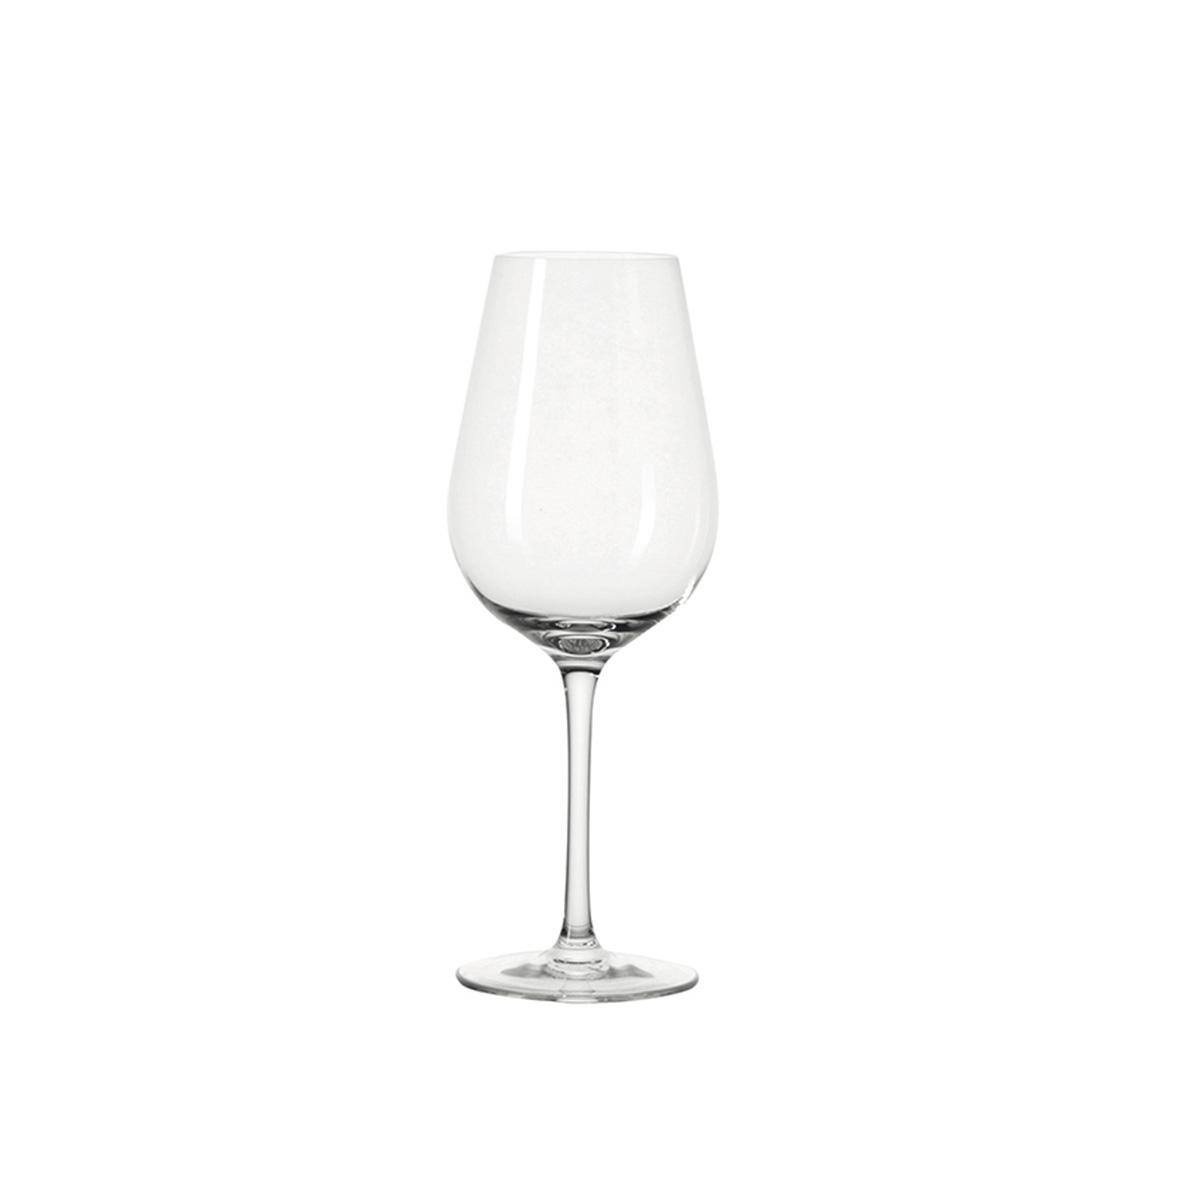 Čaša za crno vino Tivoli 20964